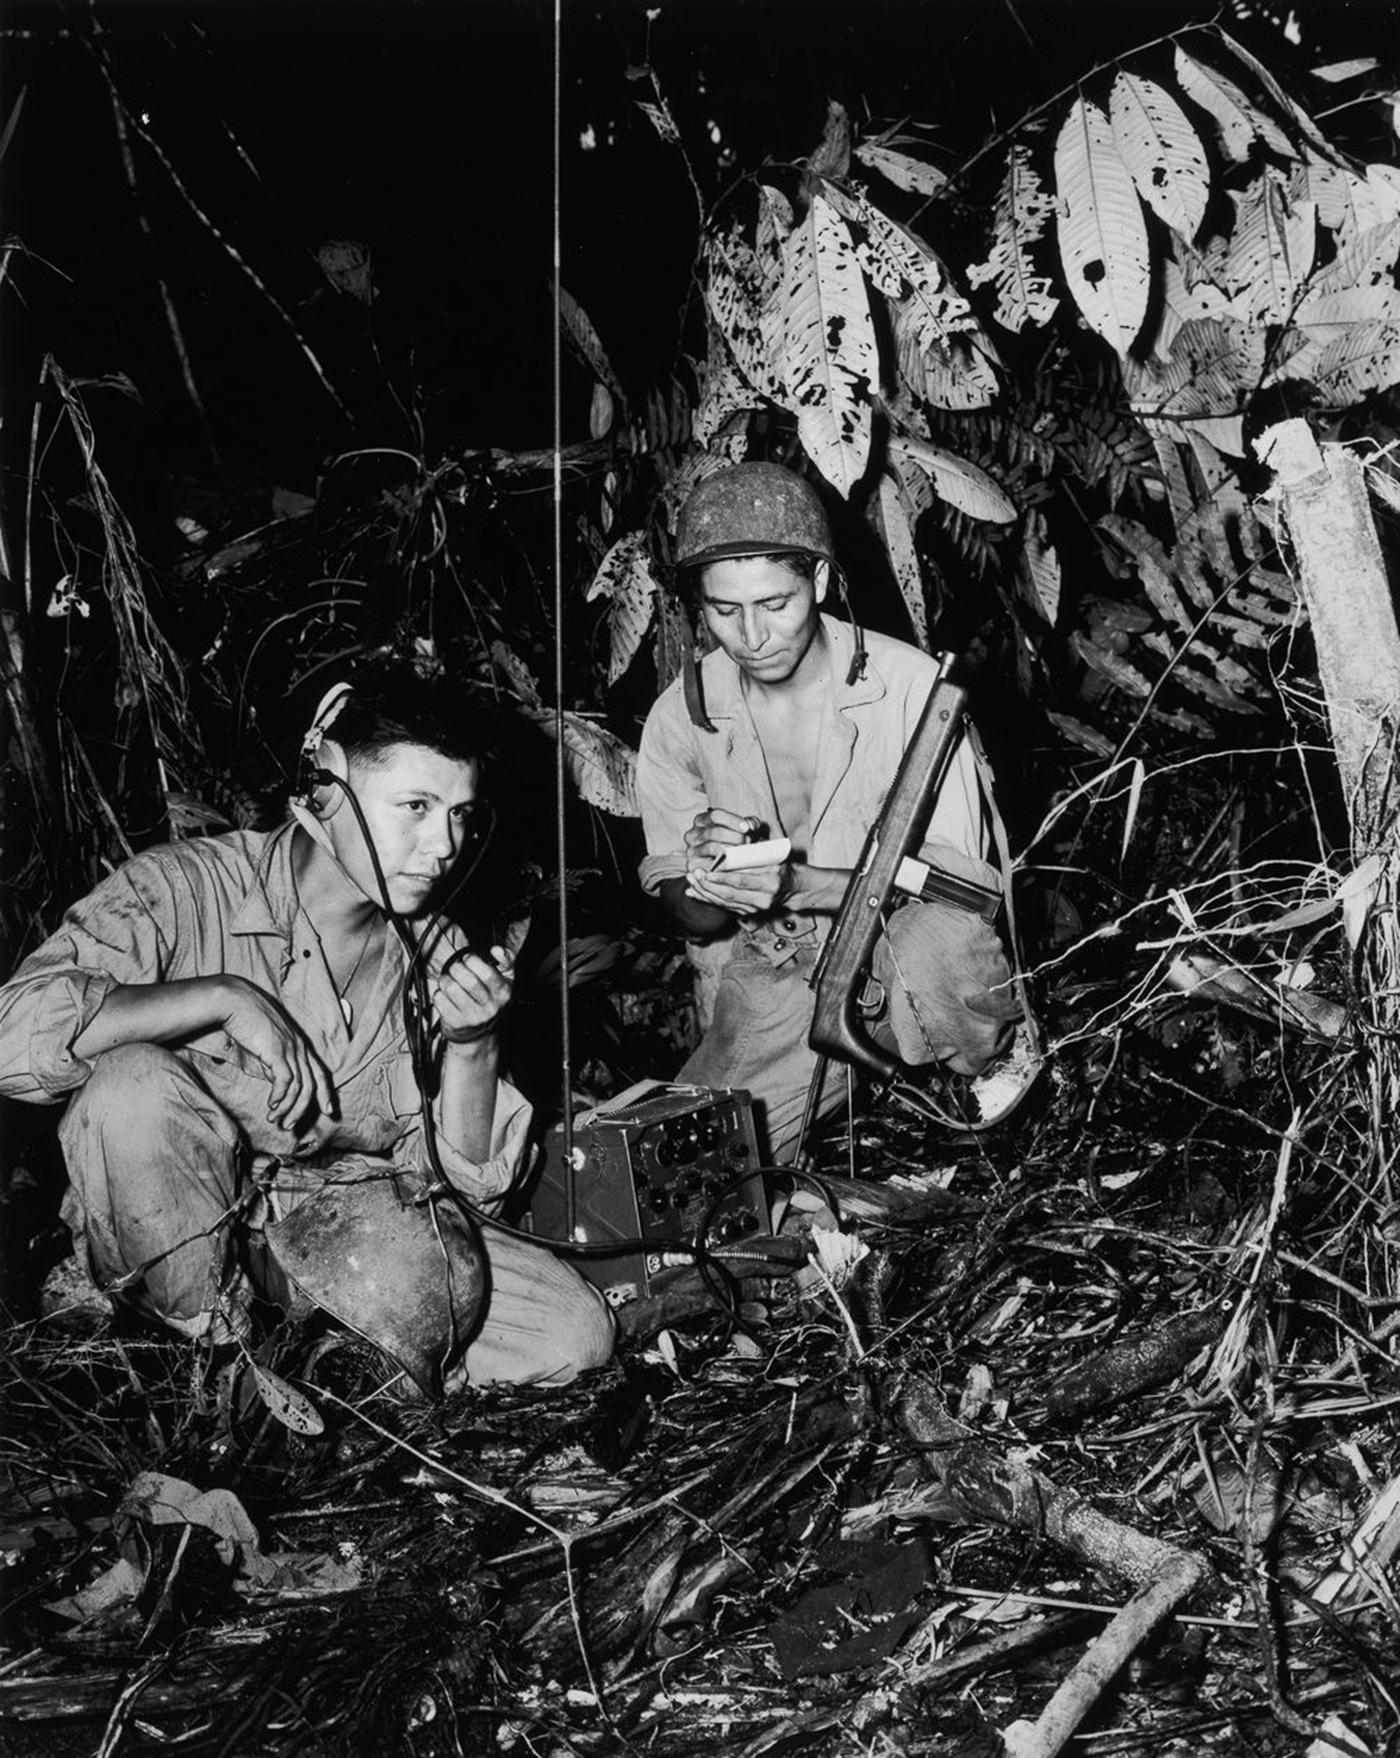 Navajo Code Talker Marines Henry Bake Jr And George H Kirk Transmit Messages From